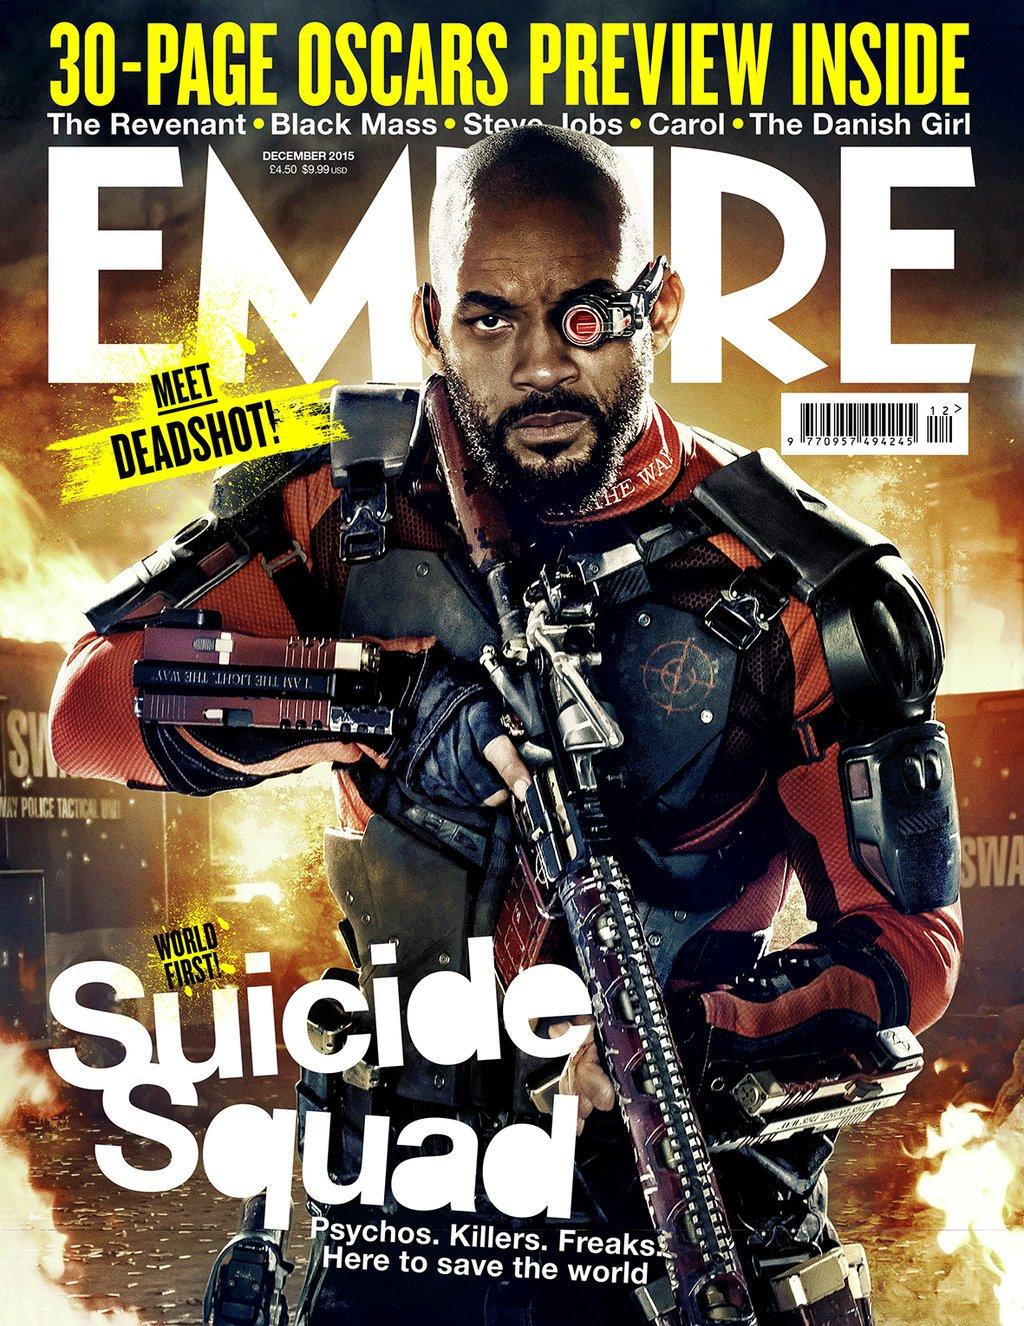 [MàJ] Suicide Squad : Le Joker, Harley Quinn, Deadshot et ... Will Smith Deadshot